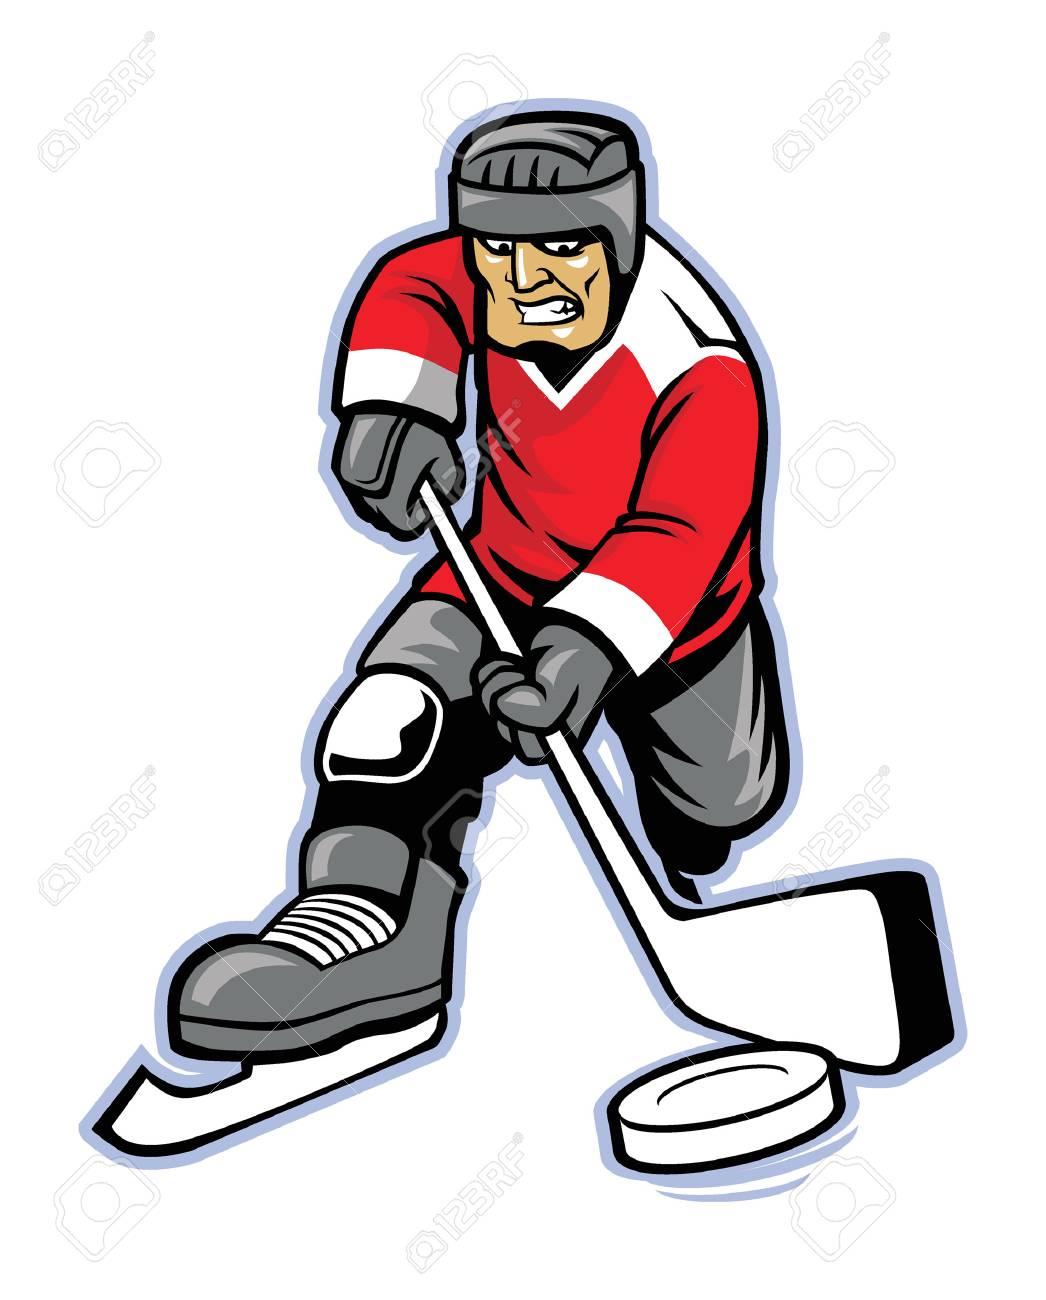 ice hockey player Illustration-ice hockey player Illustration-13